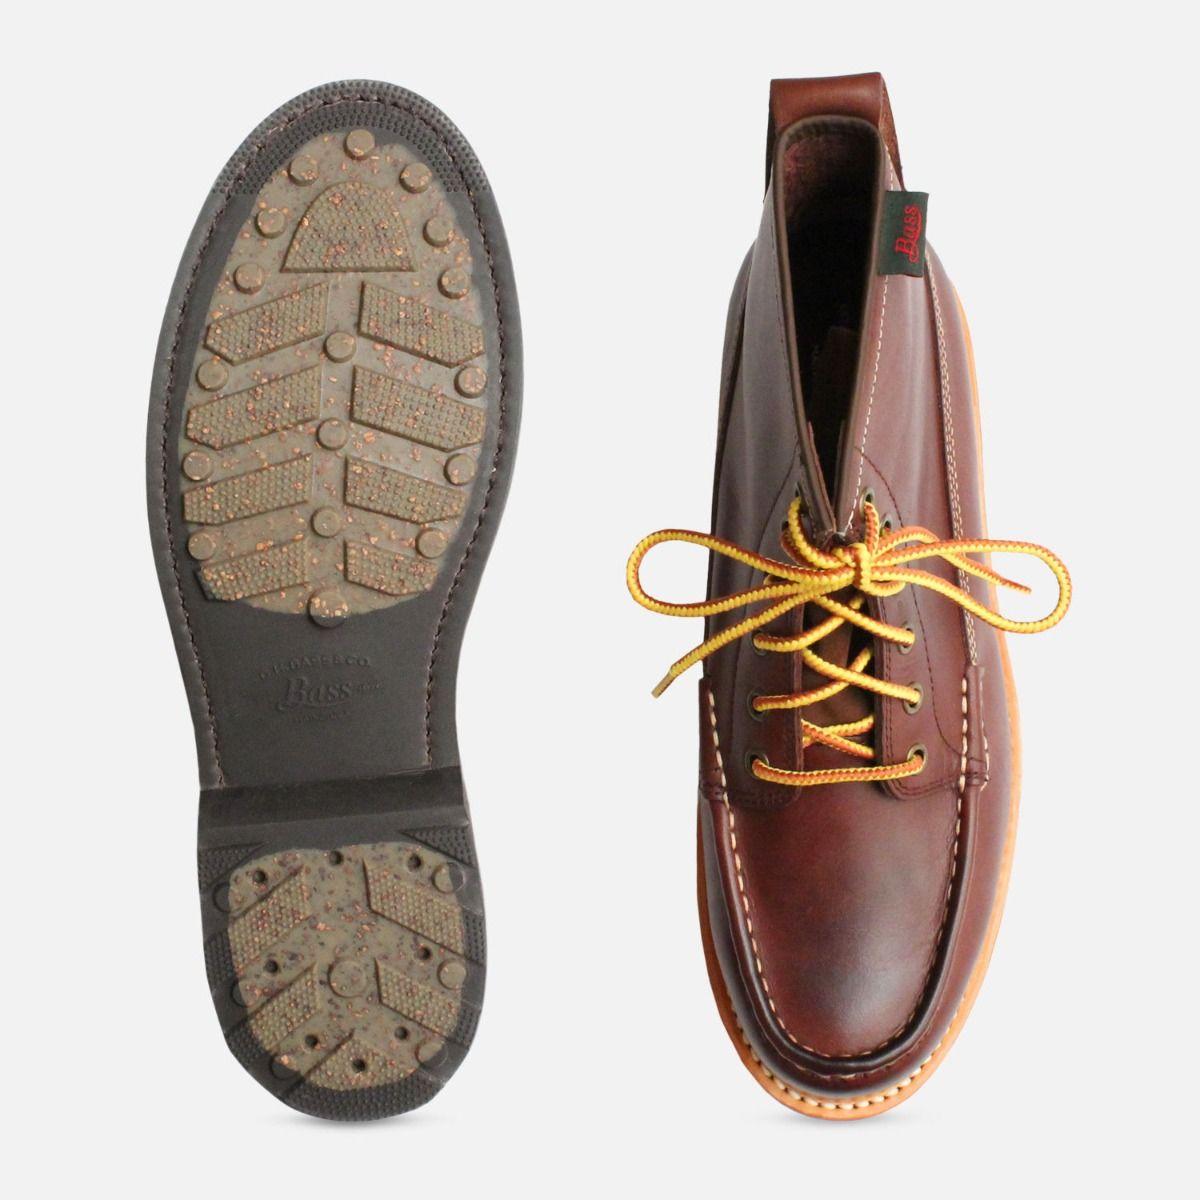 Quail Hunter Boots Dark Brown by G H Bass Shoes